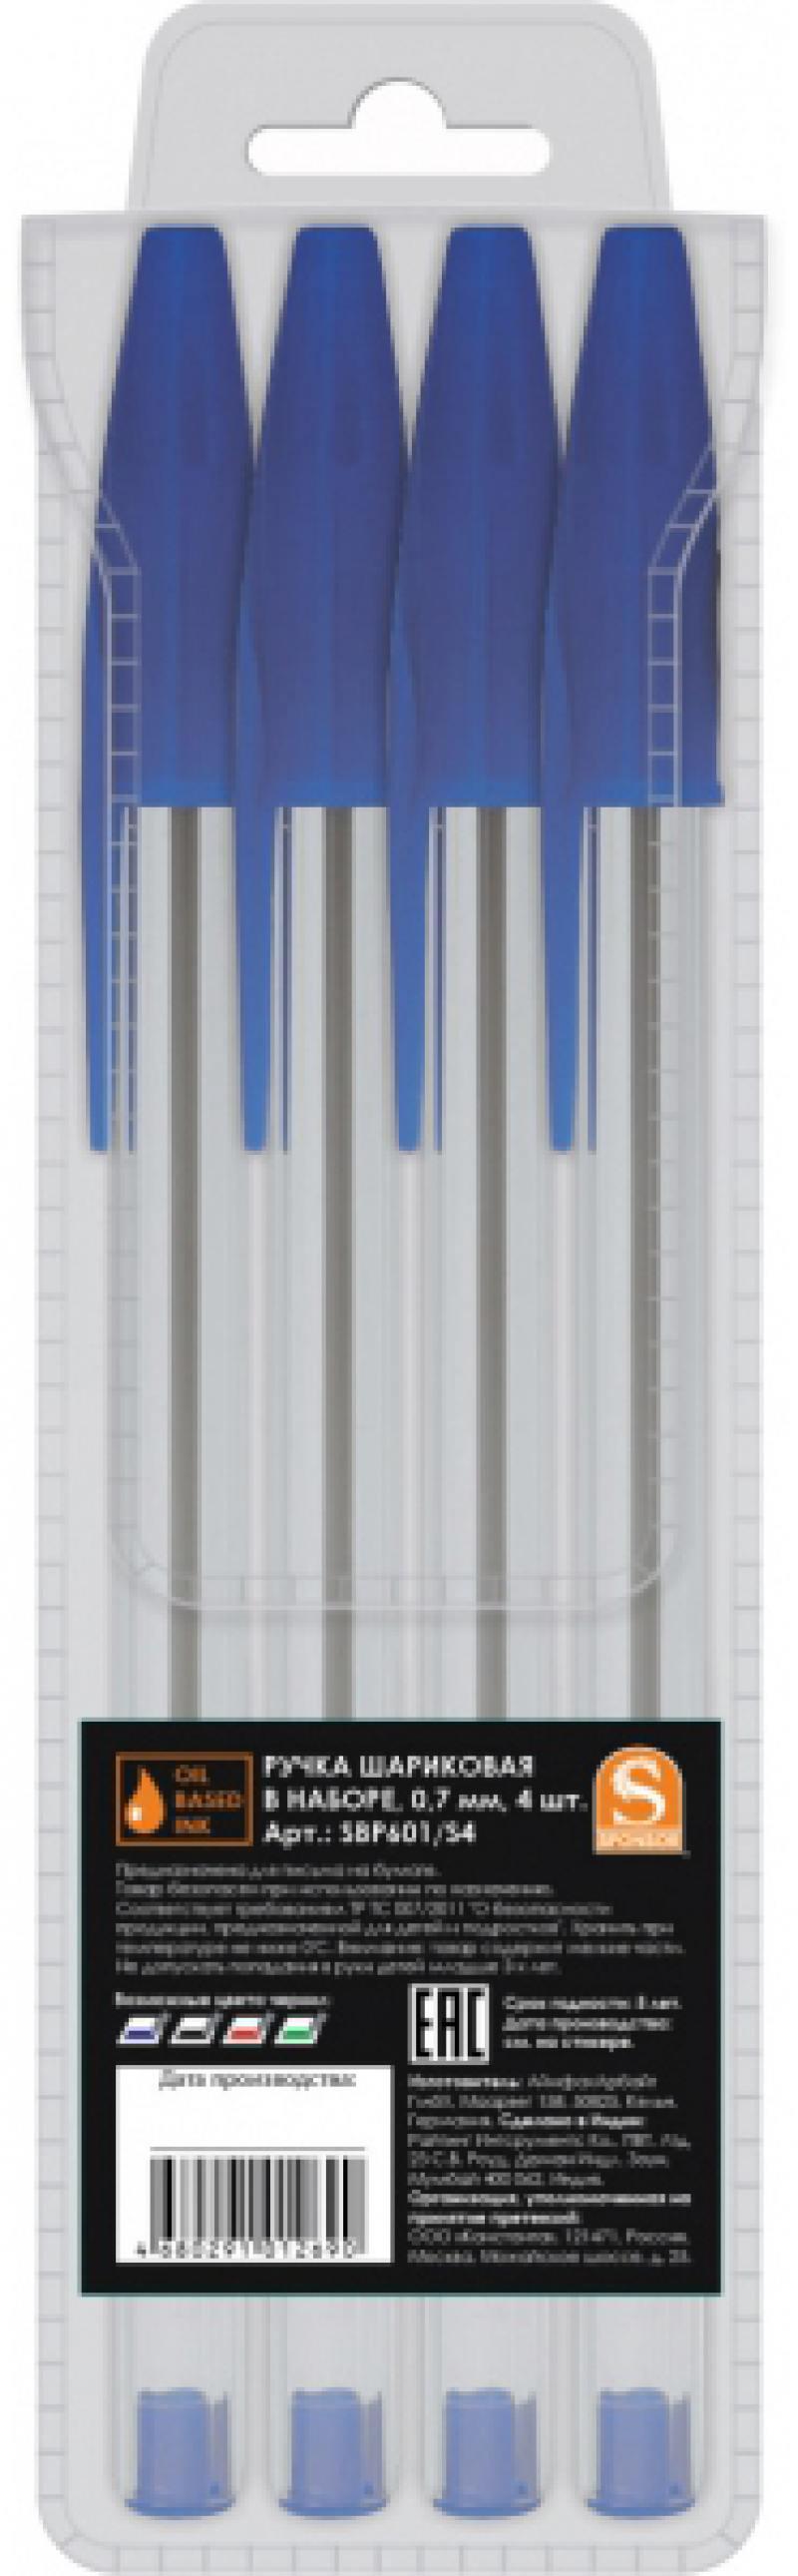 Набор шариковых ручек SPONSOR SBP601/S4-1 4 шт синий 0.7 мм SBP601/S4-1 цена